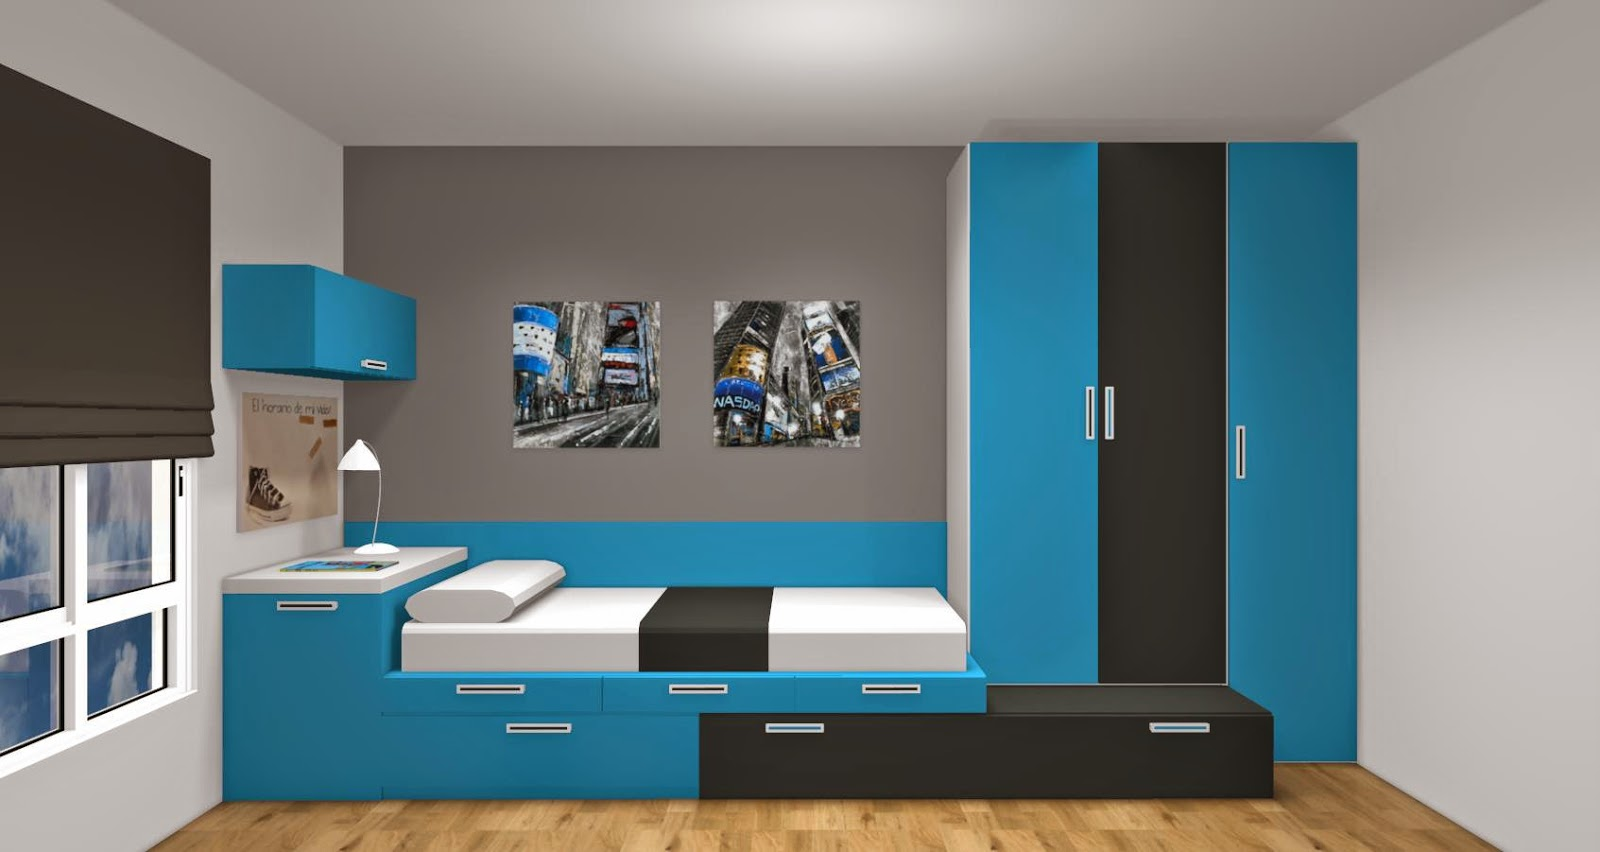 4 consejos antes de comprar dormitorios juveniles for Cuarto negro con gris